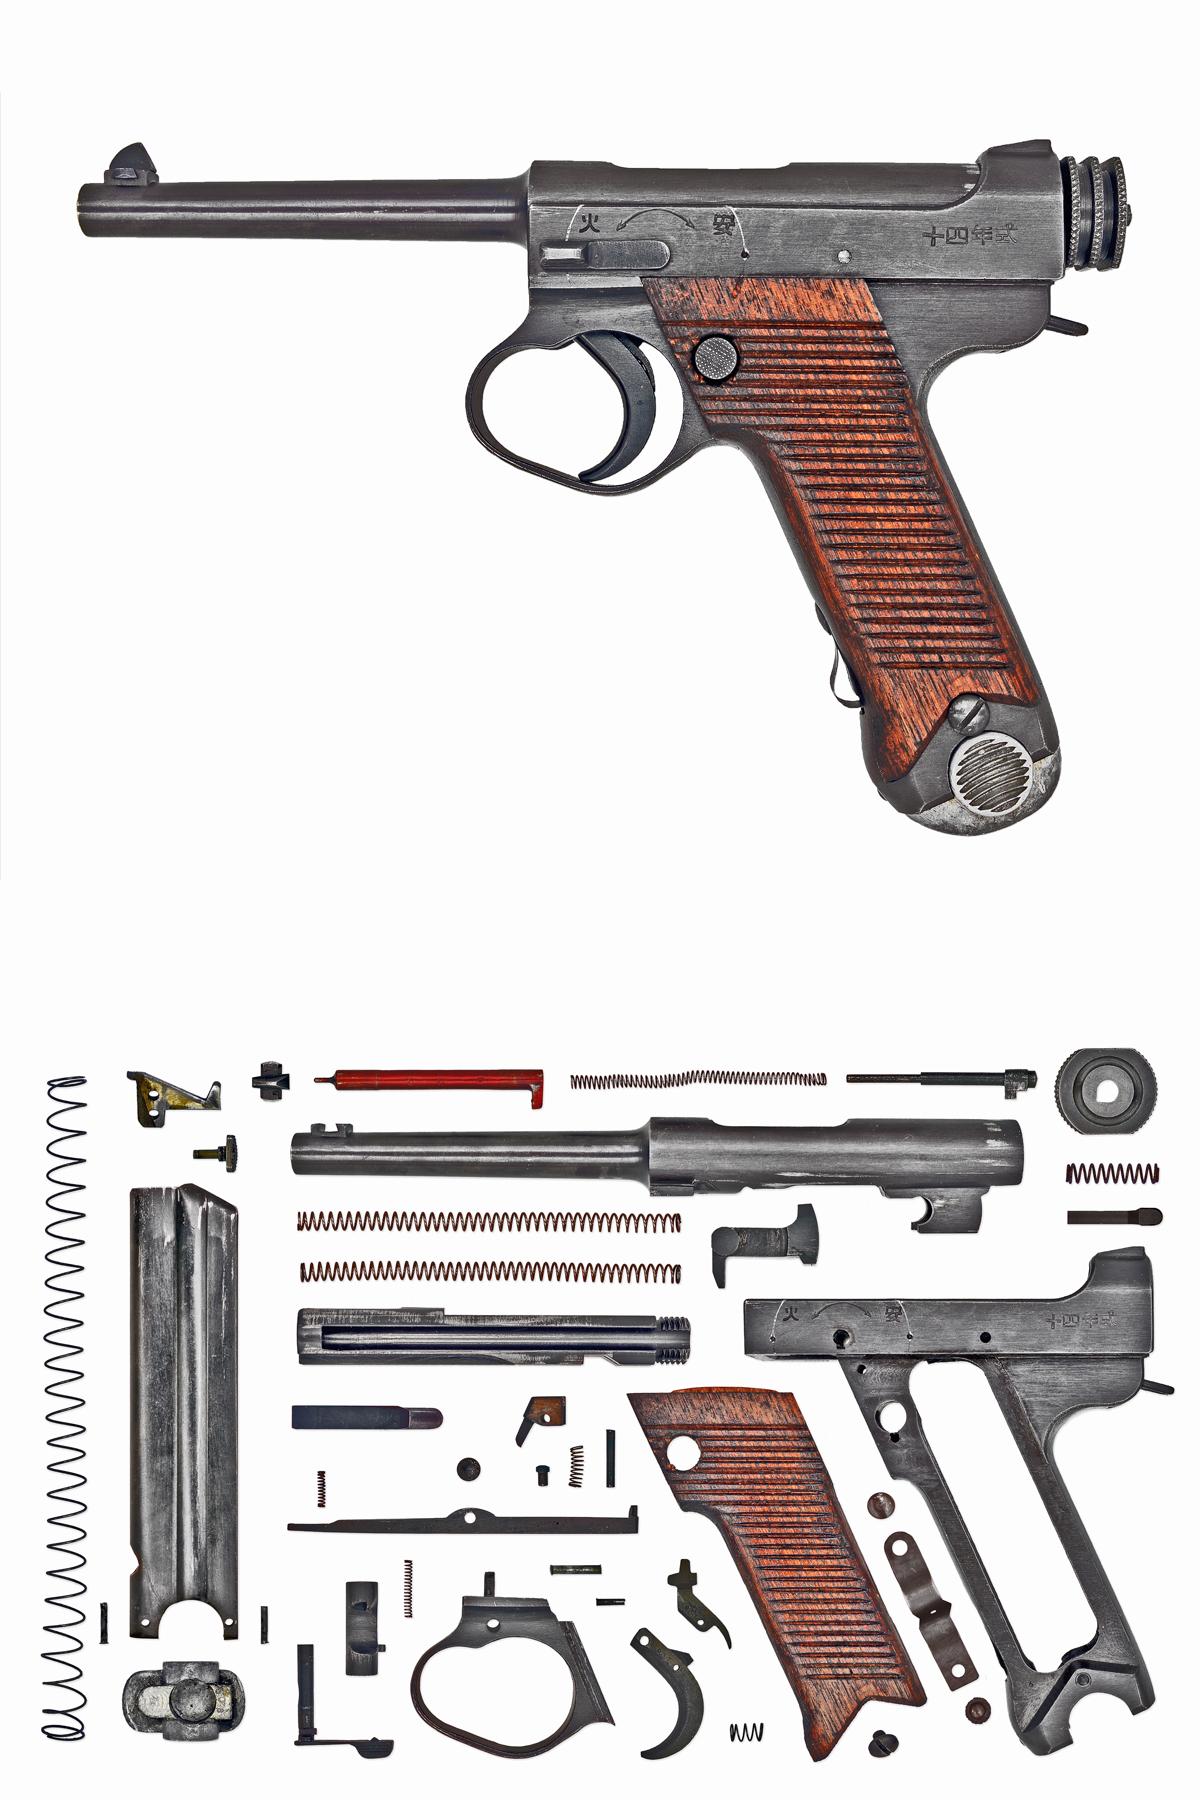 Anatomy: Japanese Pistol Nambu Type 14 – C&Rsenal